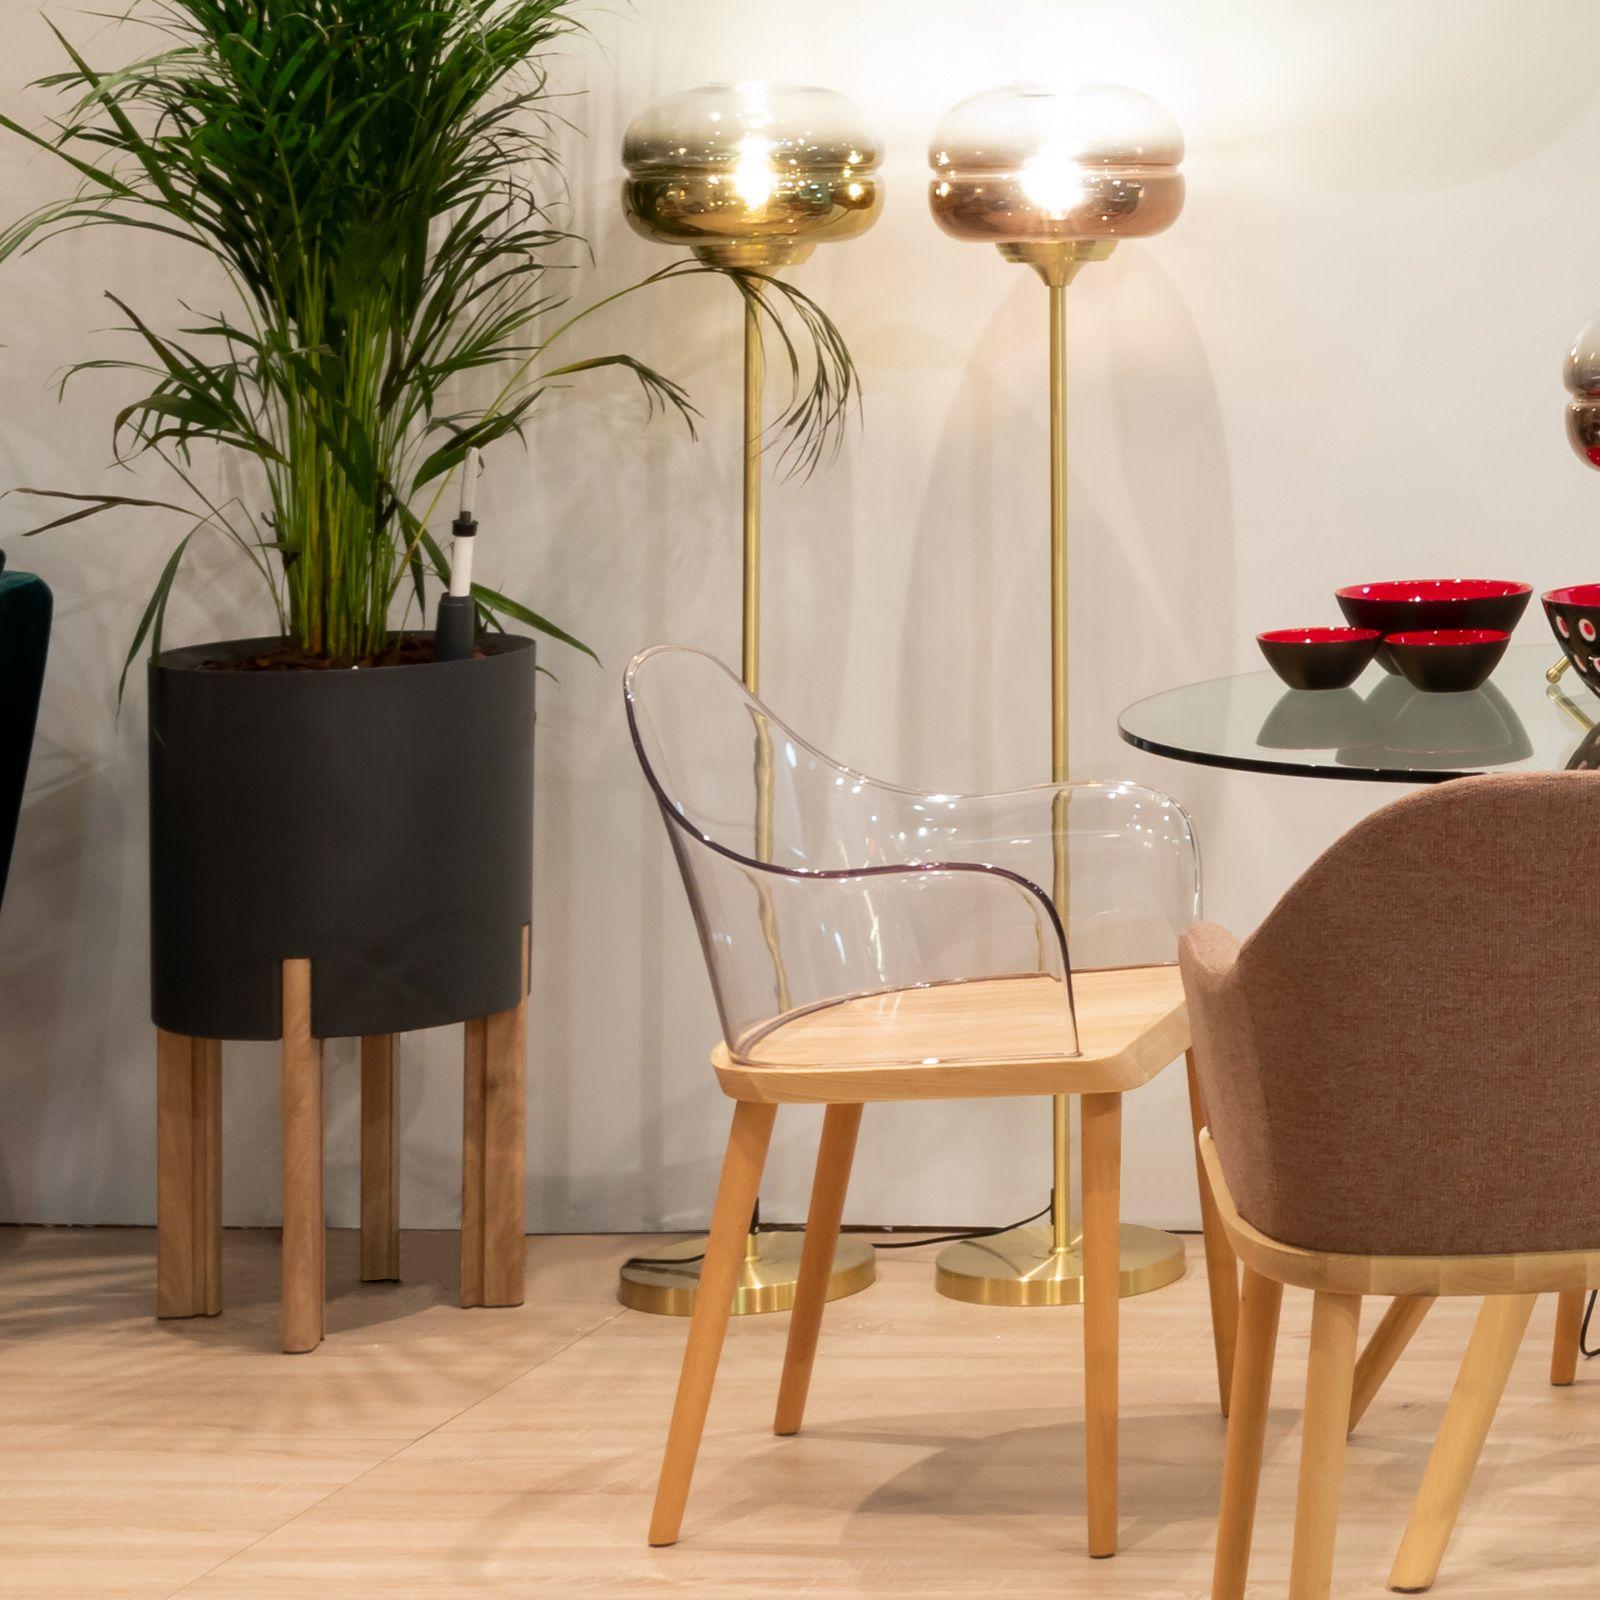 BEKSAND | Silla con brazos. Madera de fresno y policarbonato transparente (57 x 54 x 82 cm)